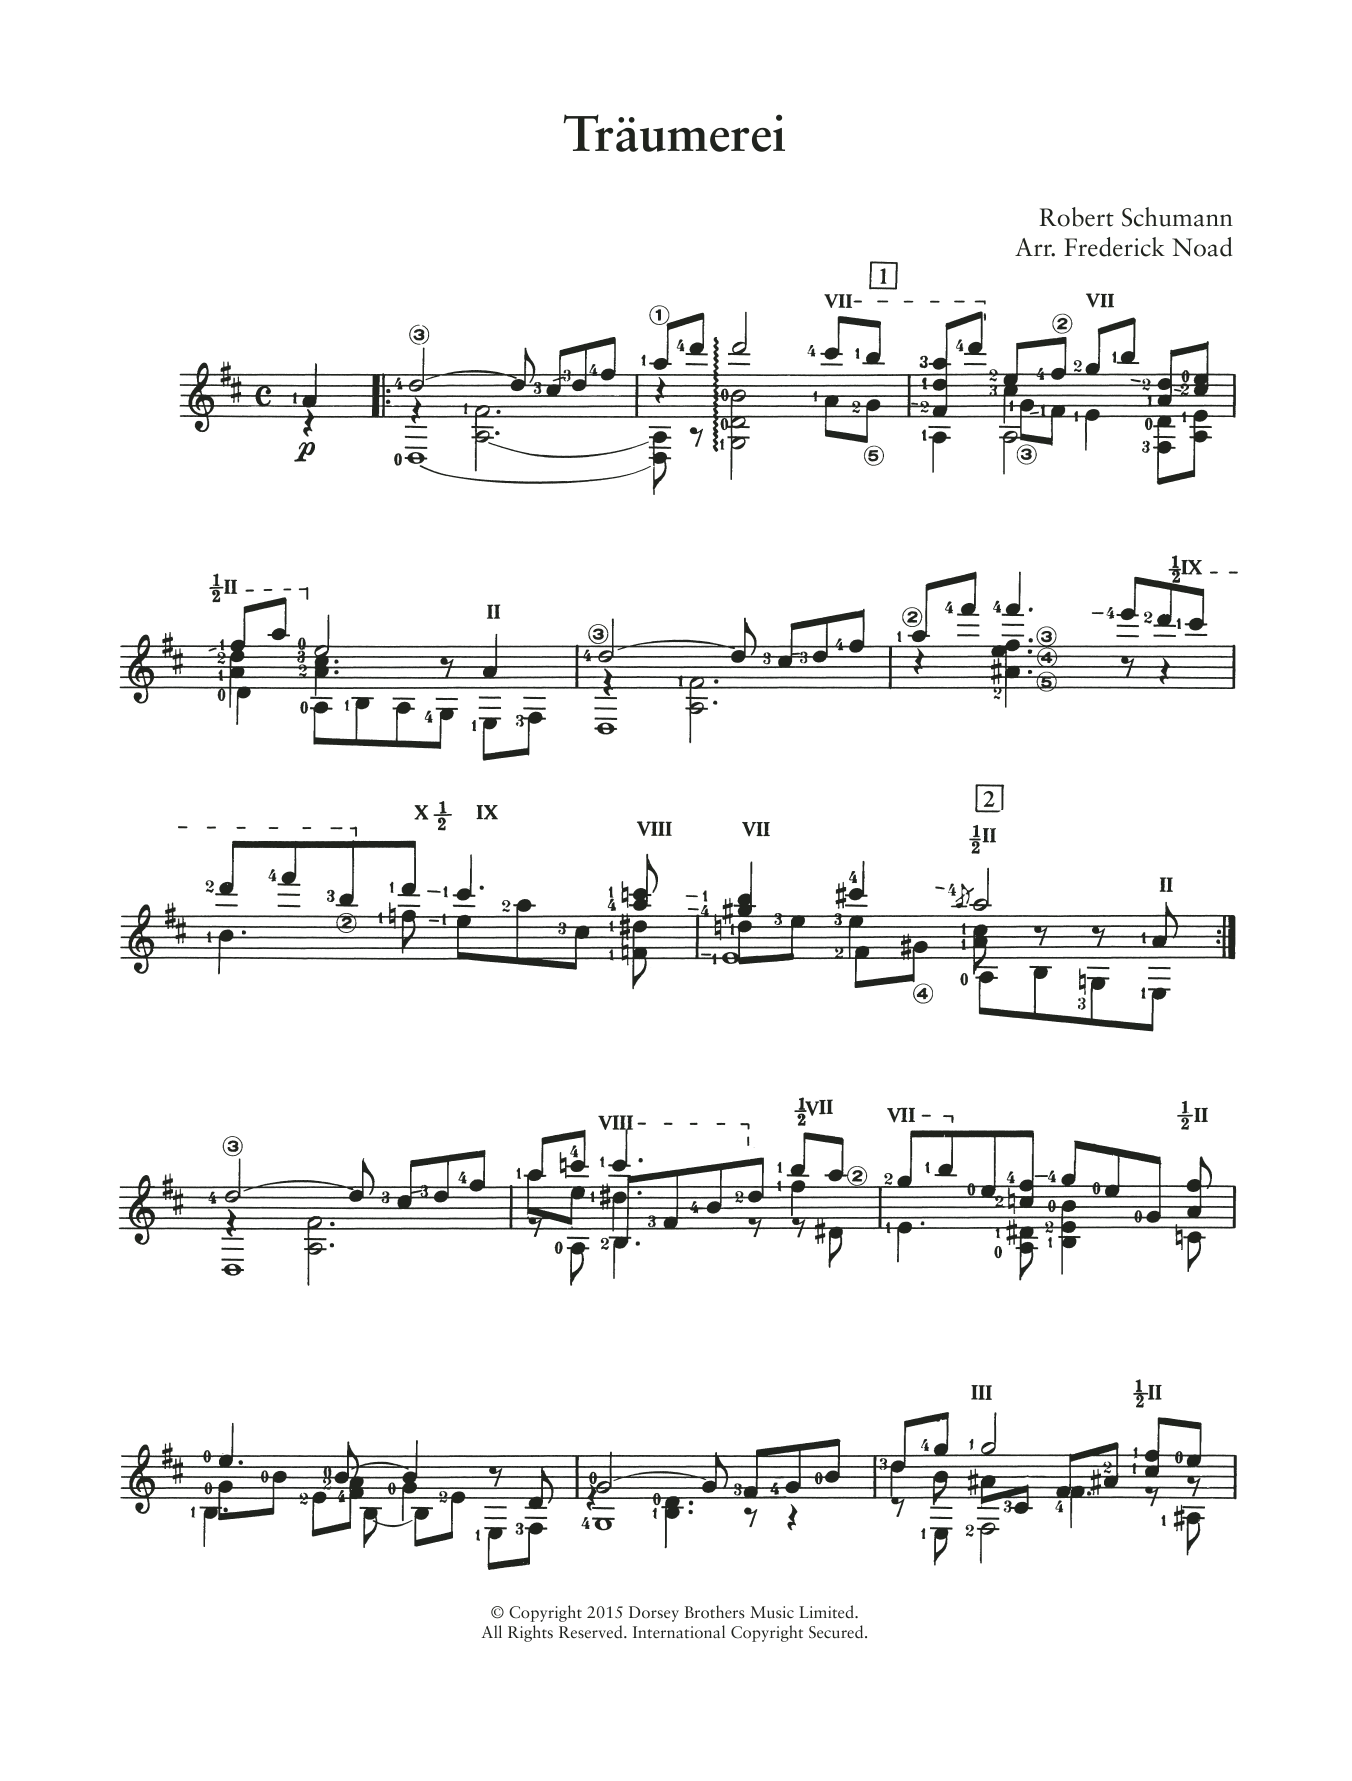 Traumerei Op.15 No.7 Sheet Music